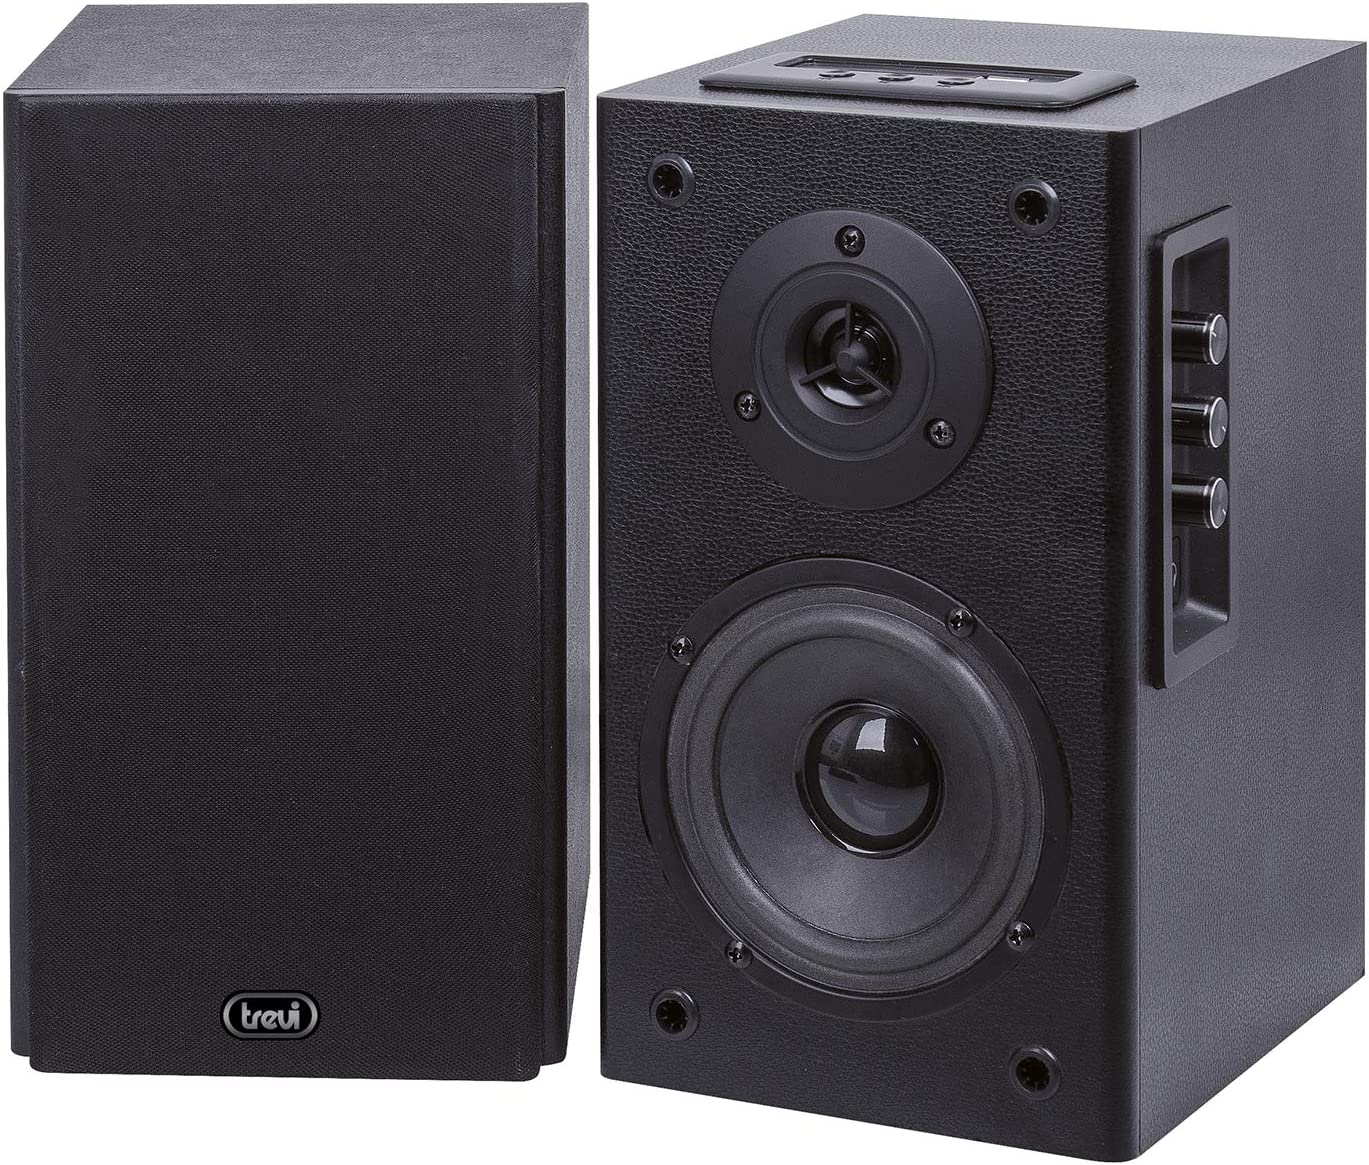 Trevi AVX 530 BT Negro Altavoz - Altavoces (De 2 vías, Inalámbrico, Bluetooth/USB/RCA/3.5mm, Negro)